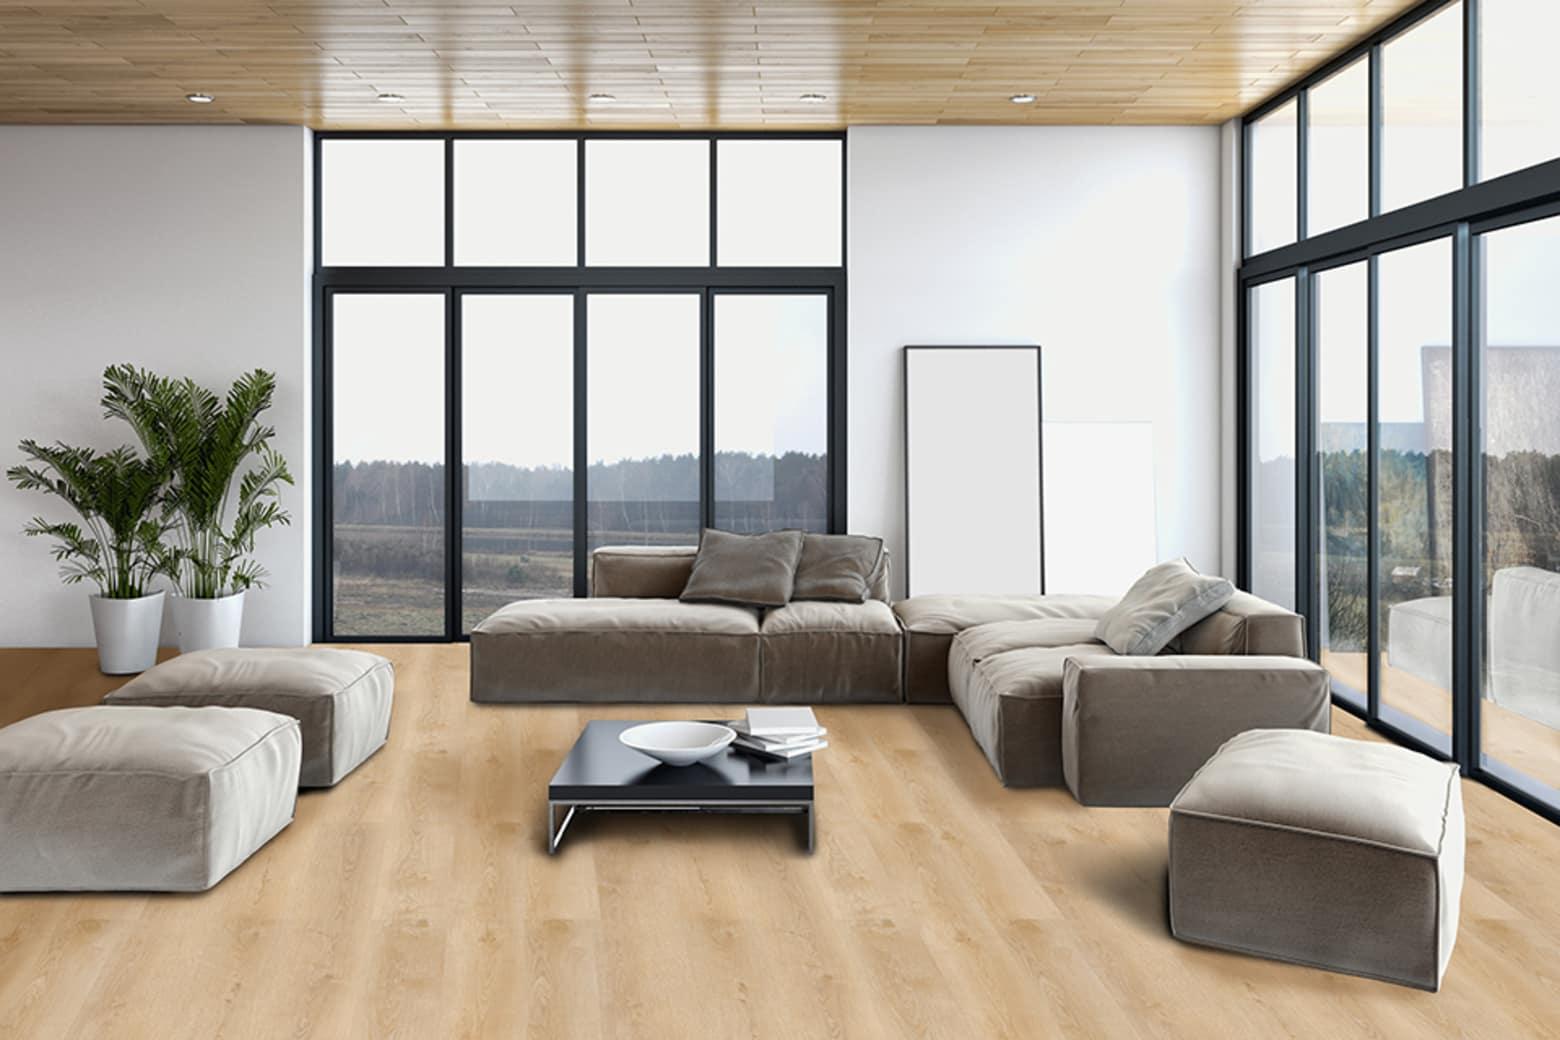 Luxury Click Vinyl Flooring Milan White 5mm By 169mm By 1210mm